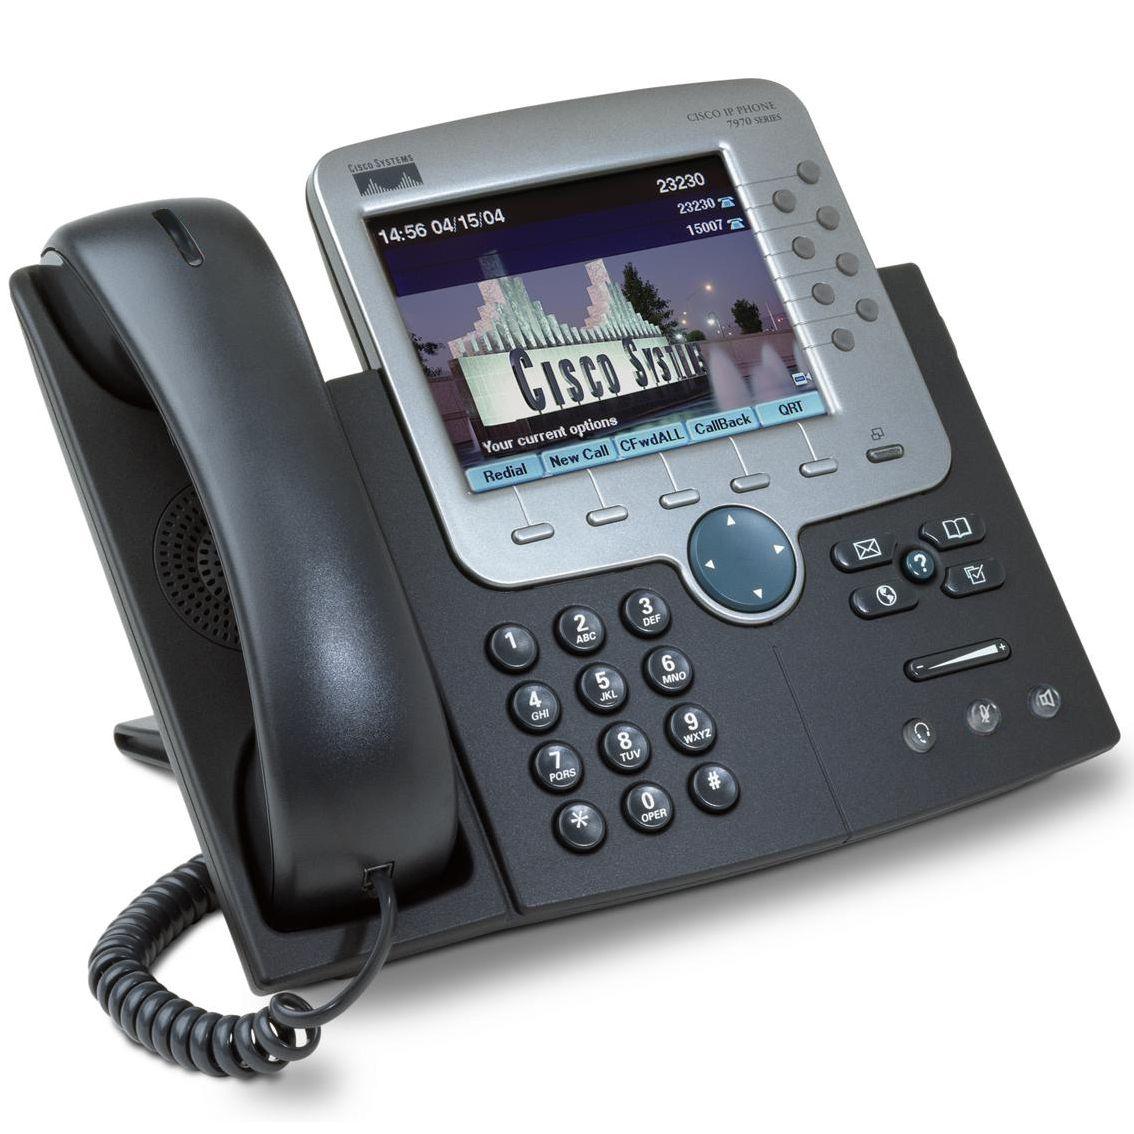 Cisco USED IP Phone 7970G, Dark Gray - CISCO 10076